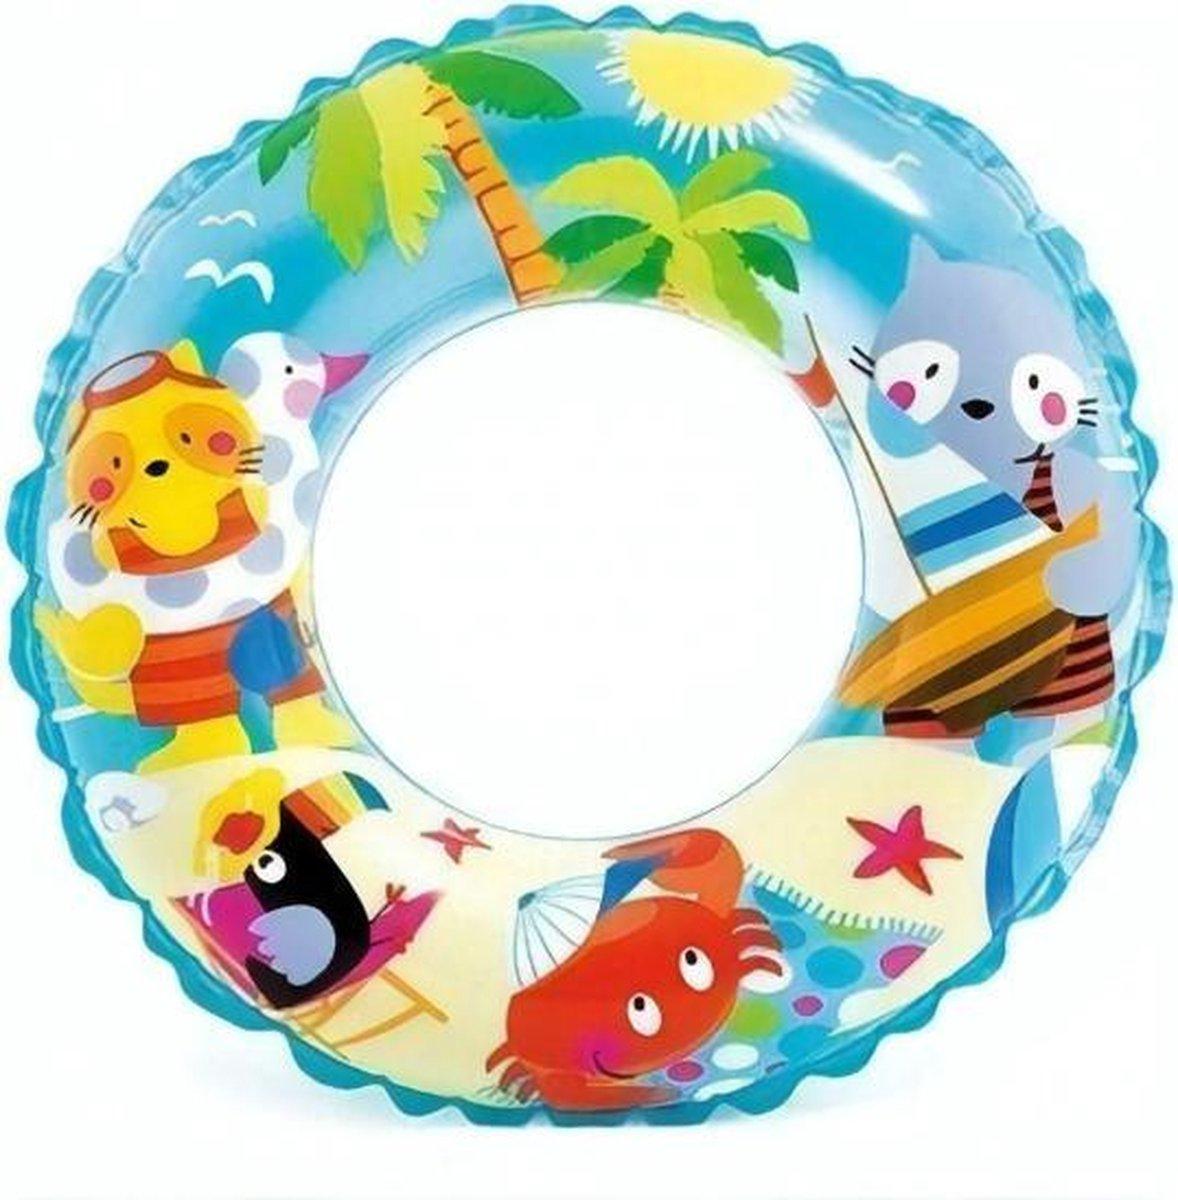 Intex Zwemband Junior 61 Cm Pvc Blauw